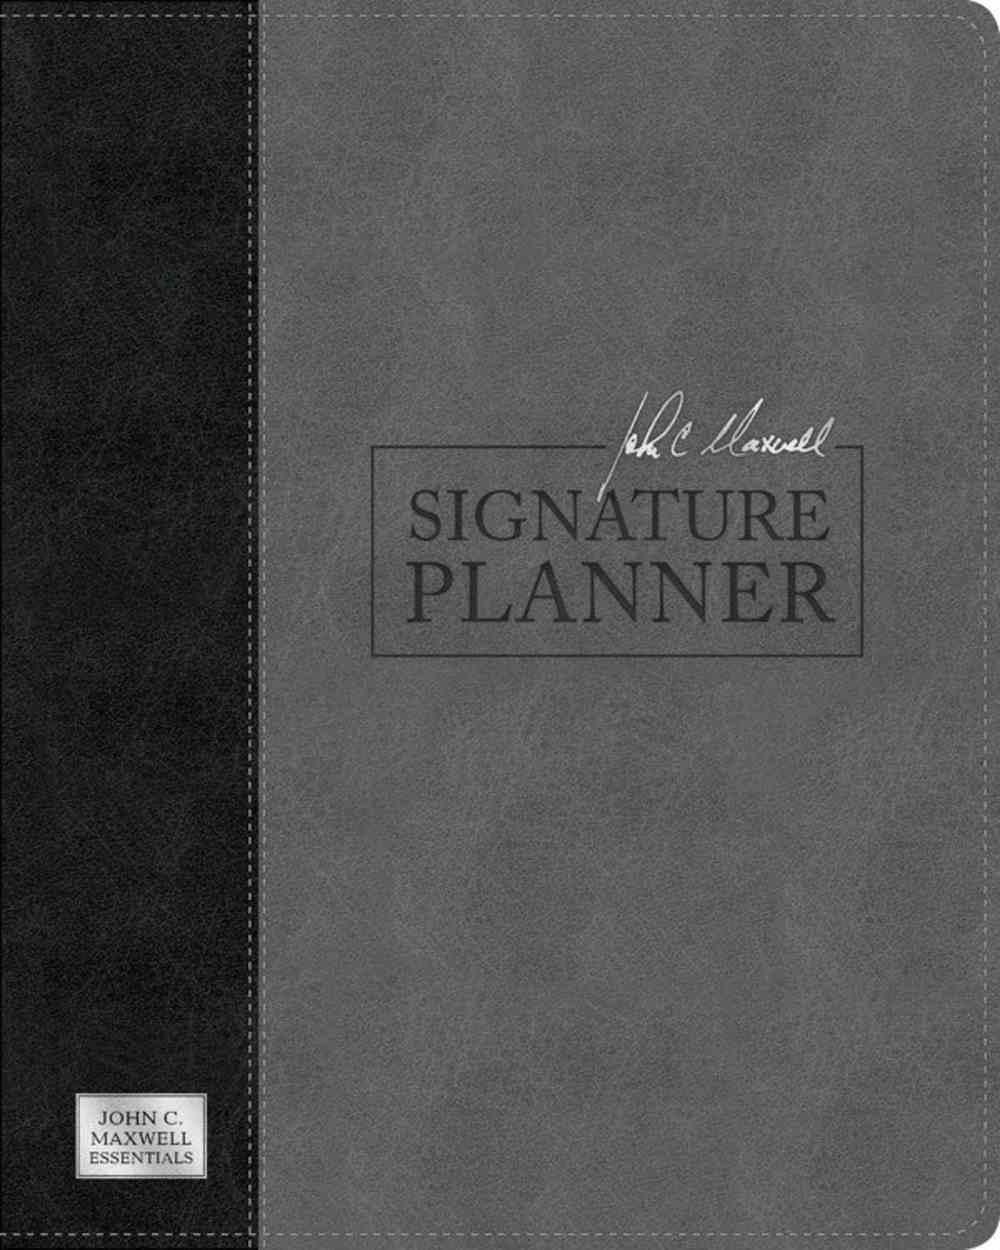 Undated Diary/Planner: John C. Maxwell Signature Planner Gray/Black Imitation Leather